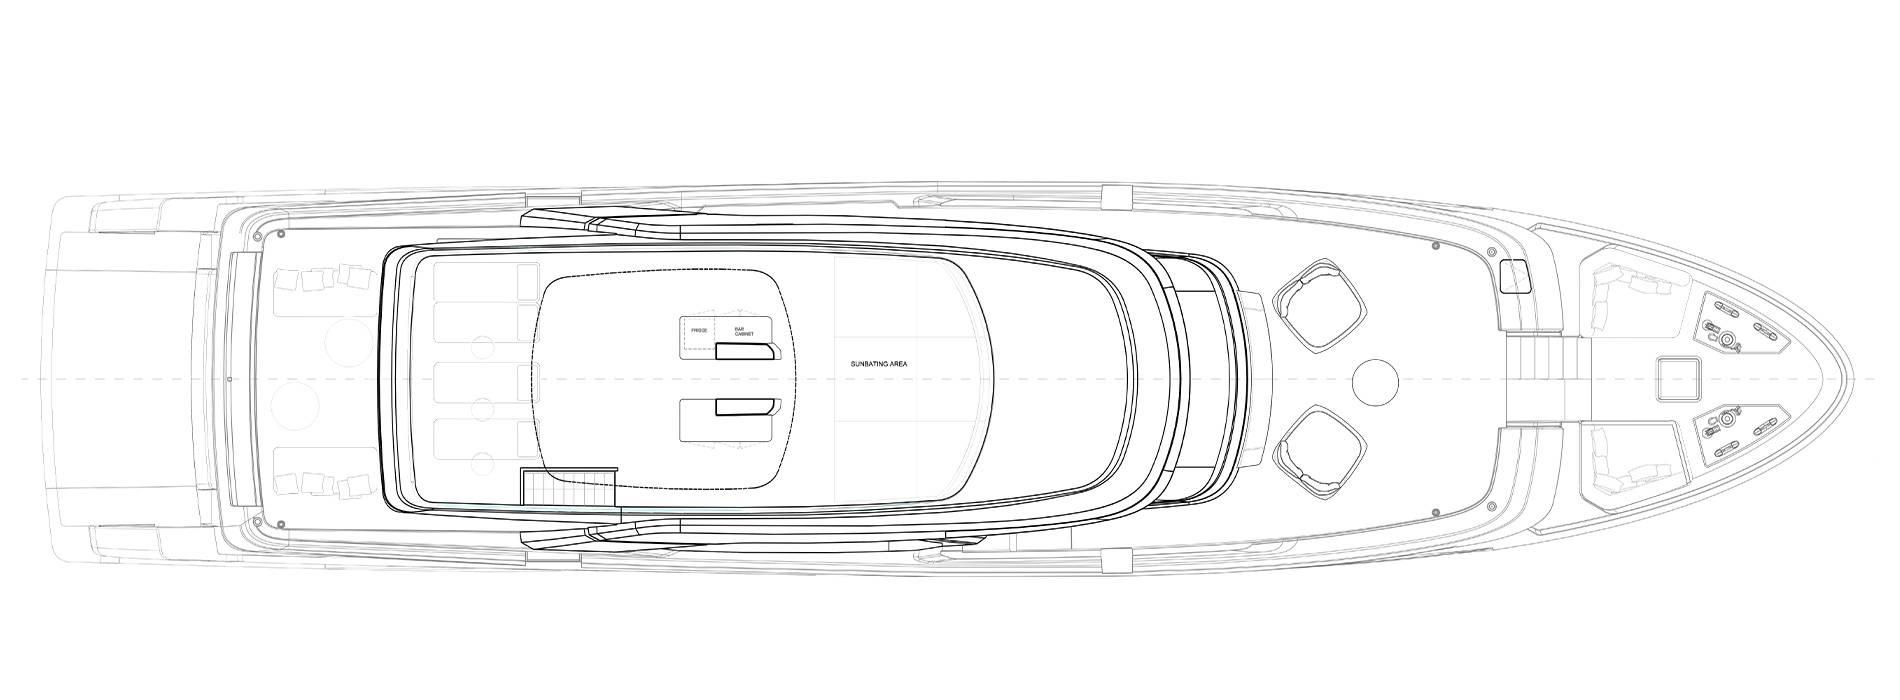 Sanlorenzo Yachts SD118 Flying bridge